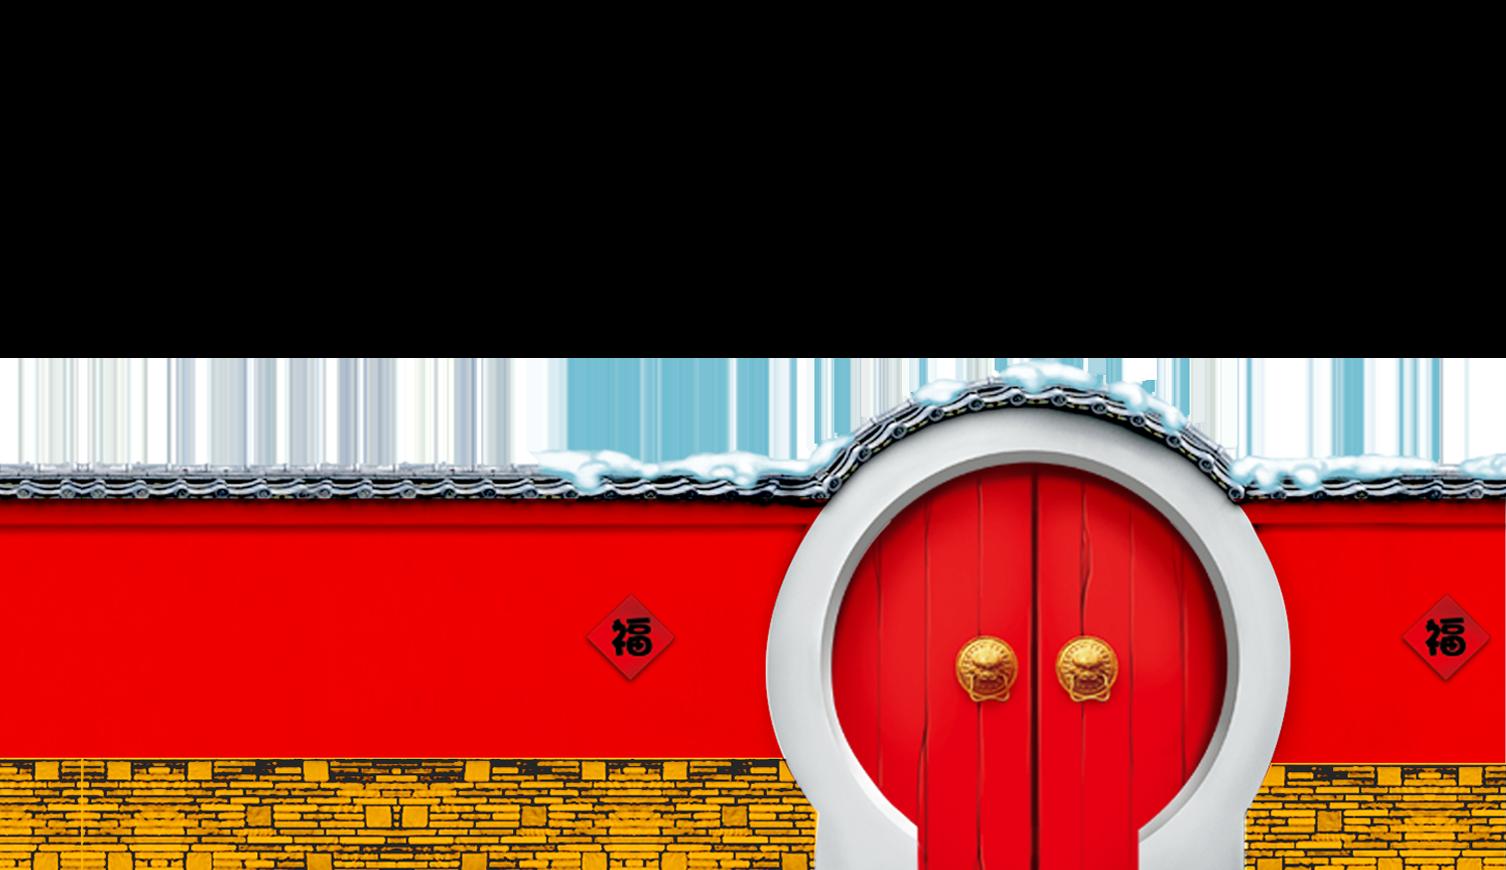 Closed Gate - China PNG Image